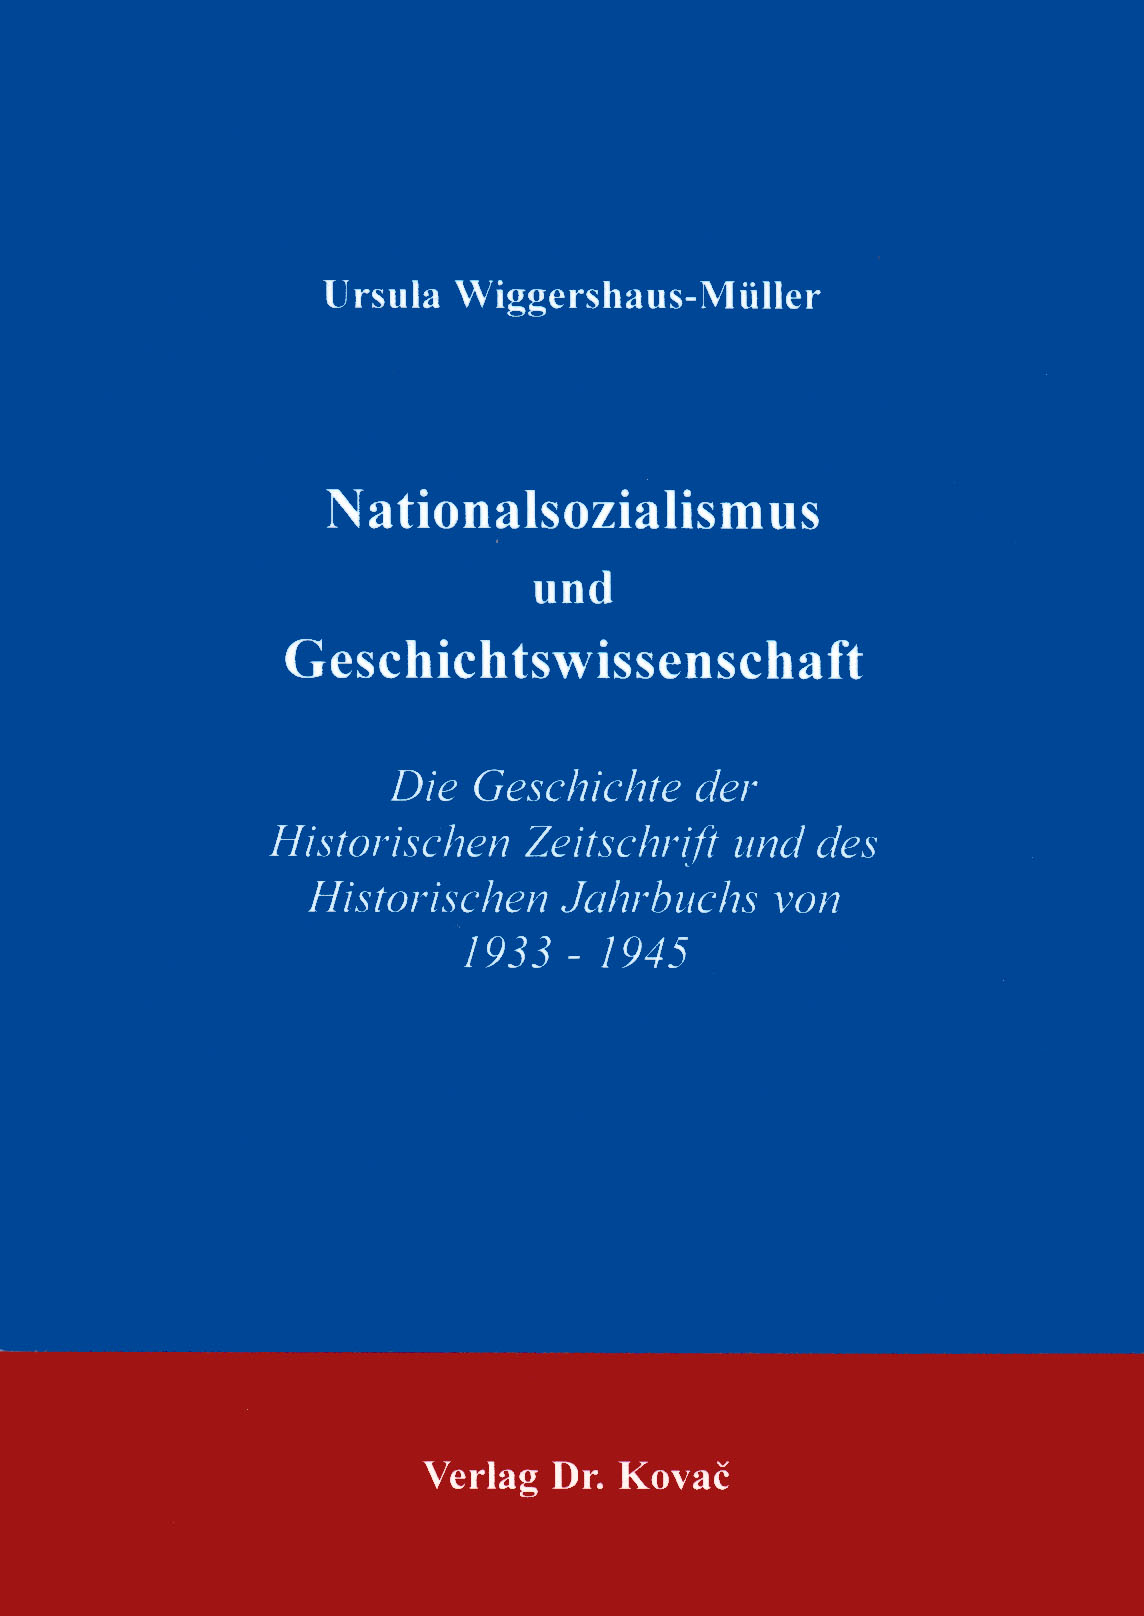 Cover: Nationalsozialismus und Geschichtswissenschaft